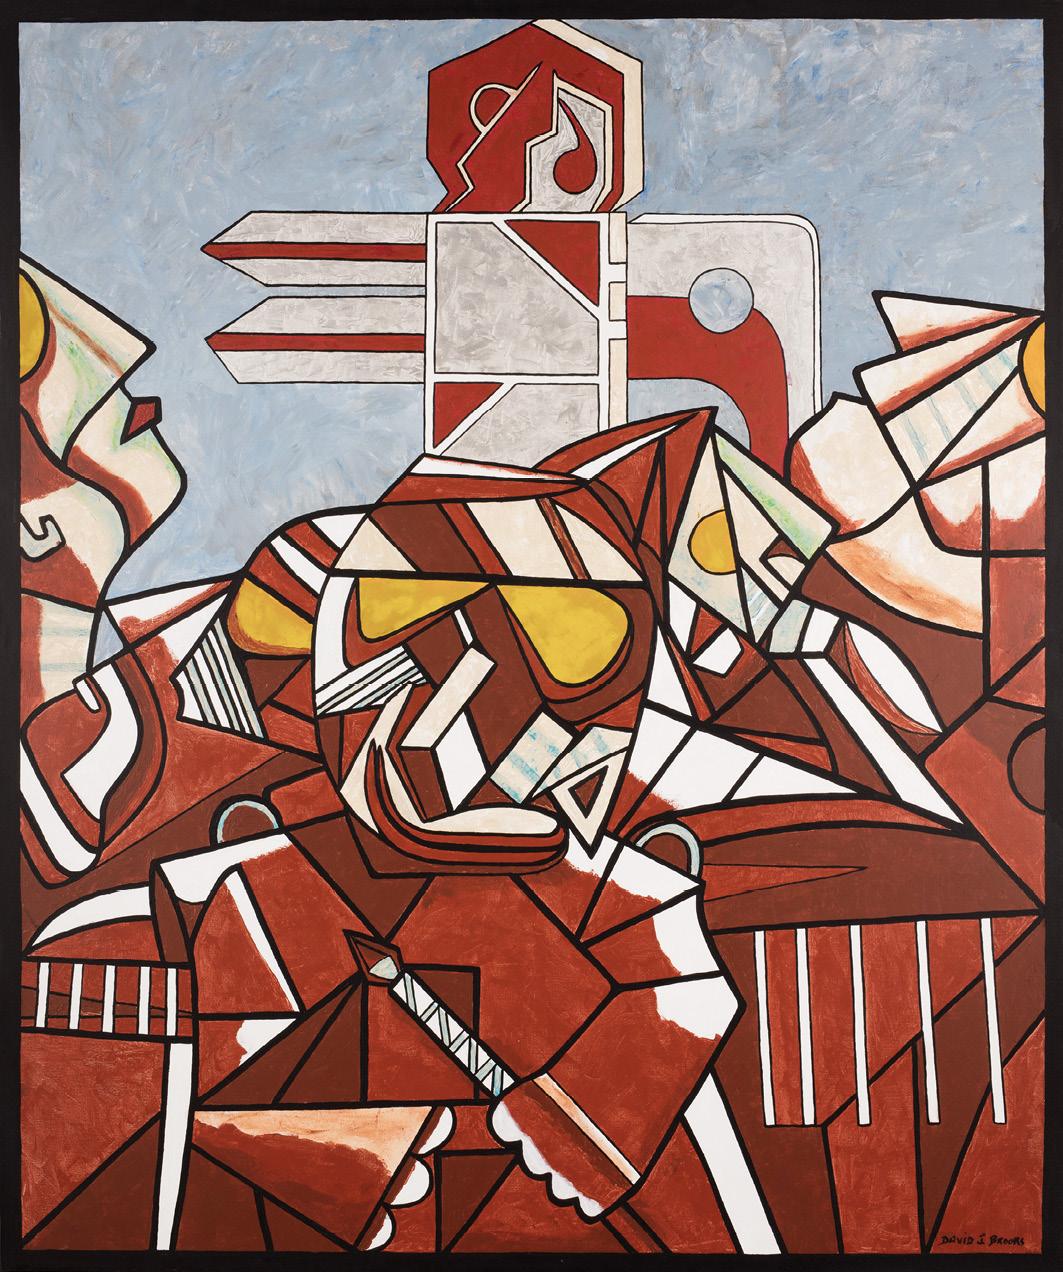 David Brooks: Tribute to past Artist - Indianische Kunst aus Kanada